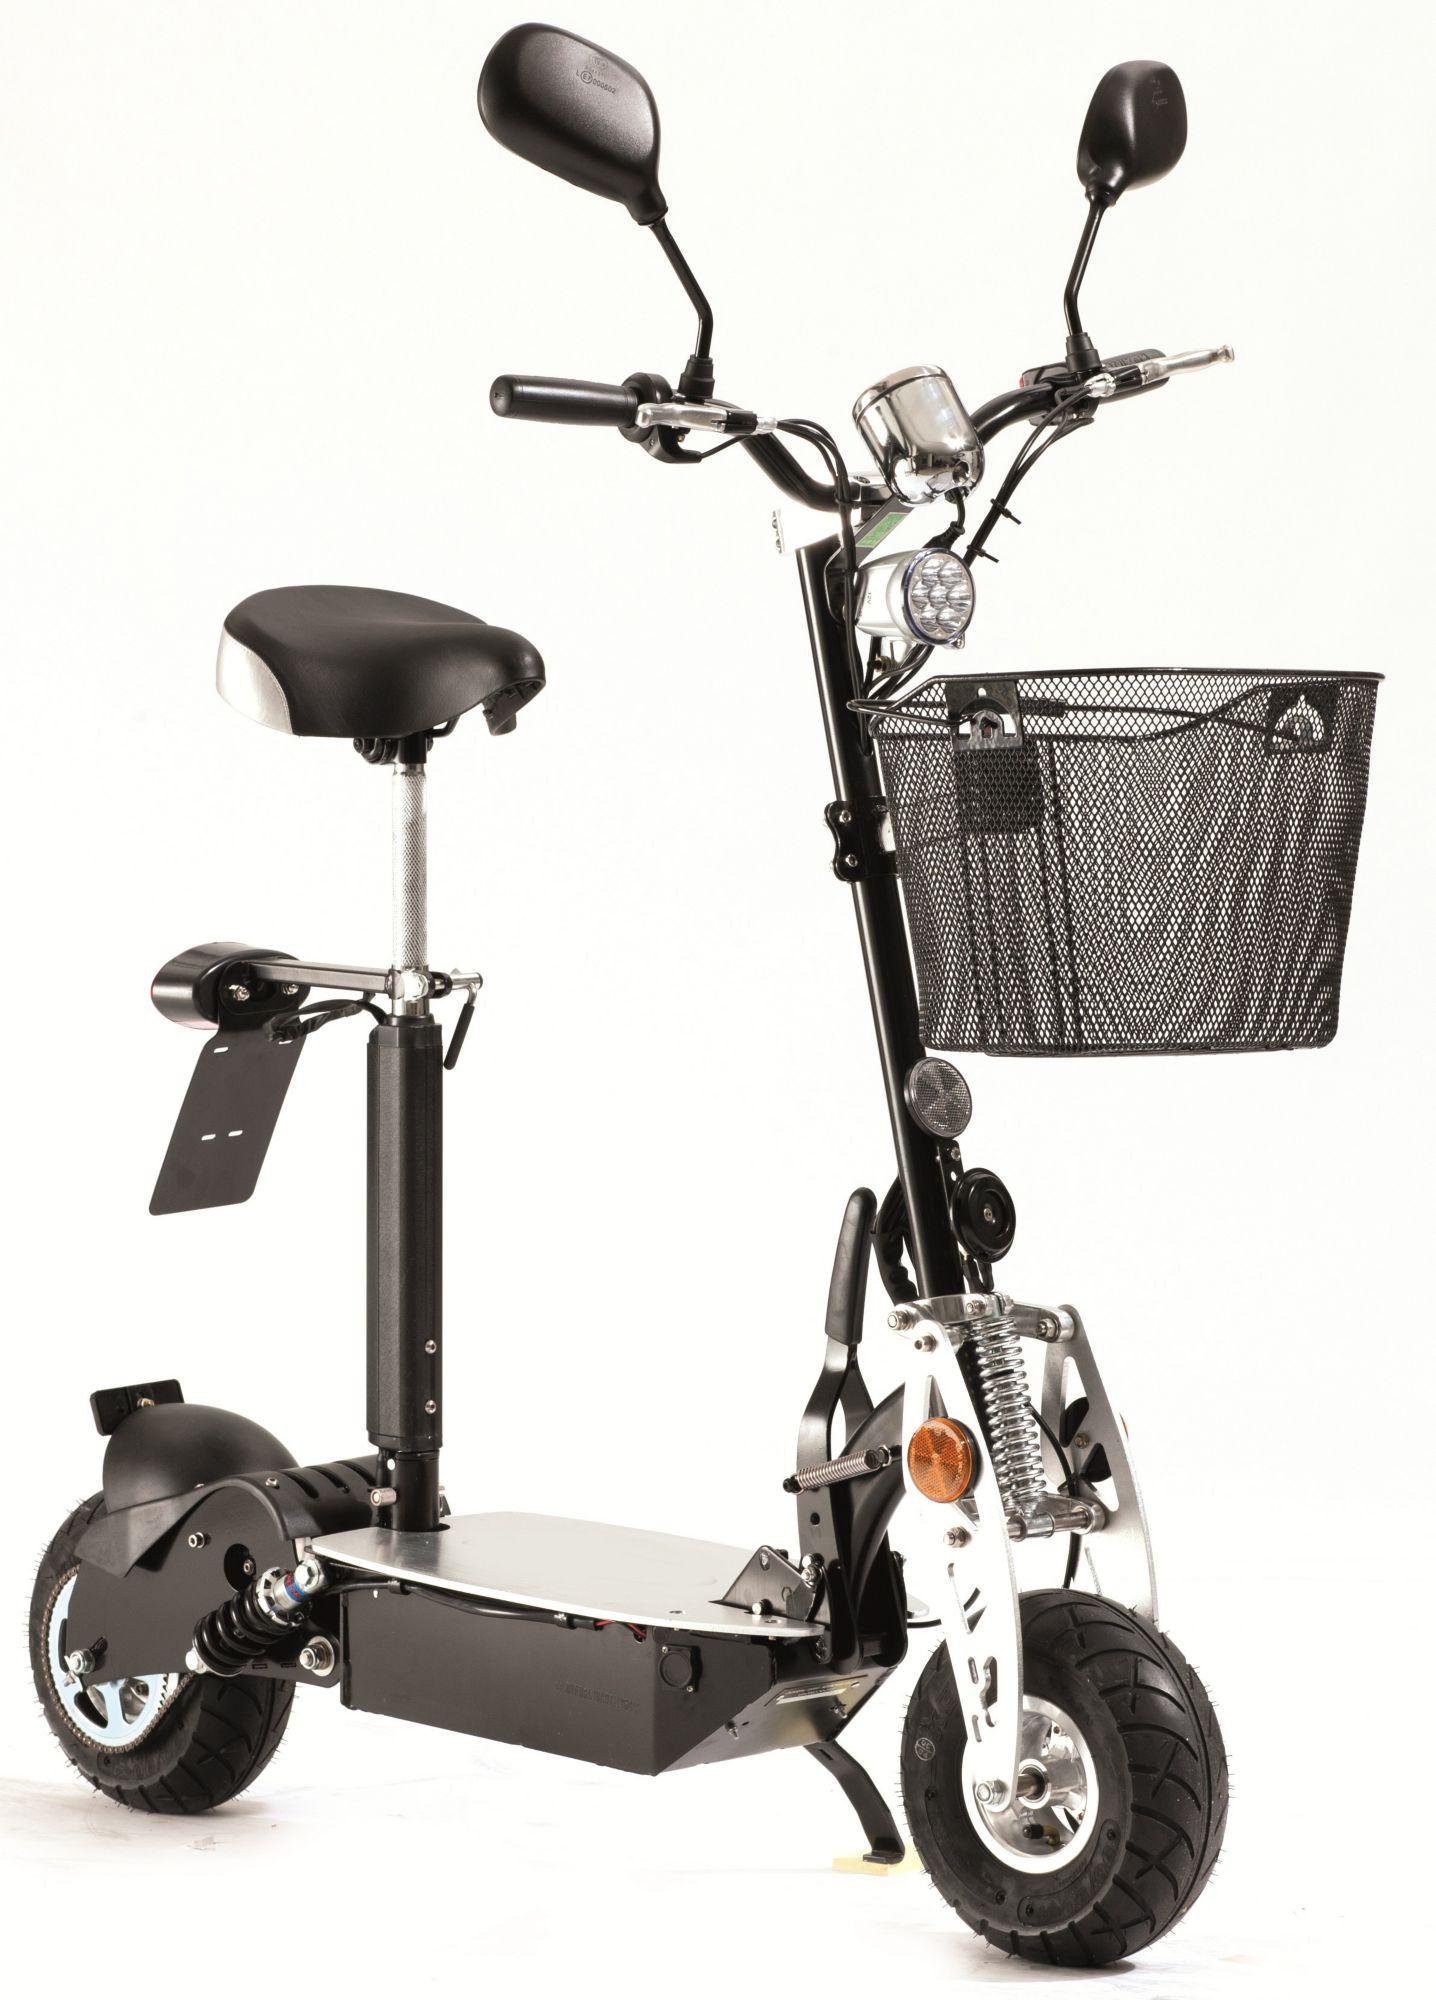 DIDI THURAU EDITION Didi Thurau Edition Elektro City Roller, 20 km/h, »Basic«